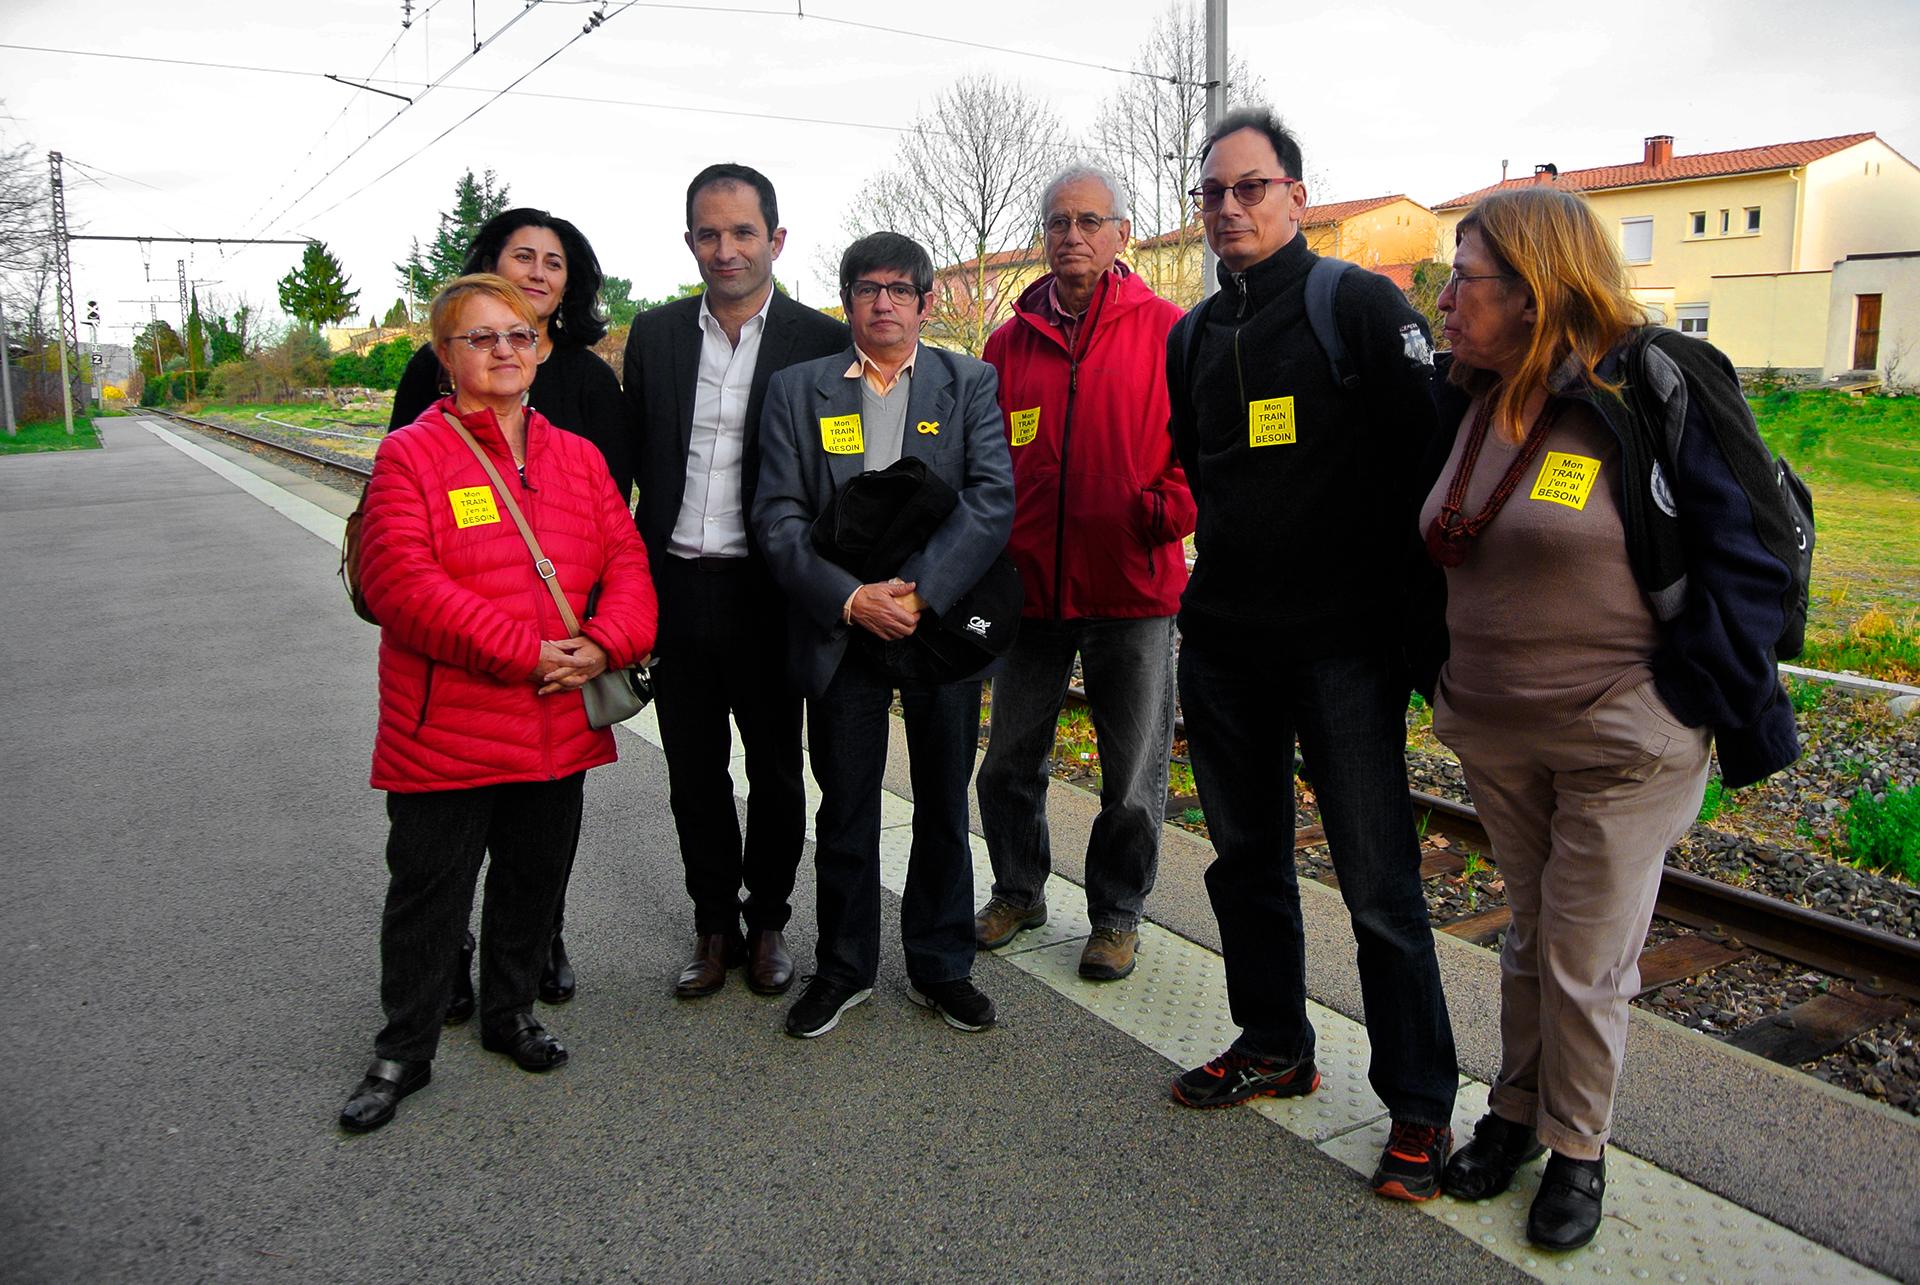 Benoit hamon et l association train en tet en gare de prades